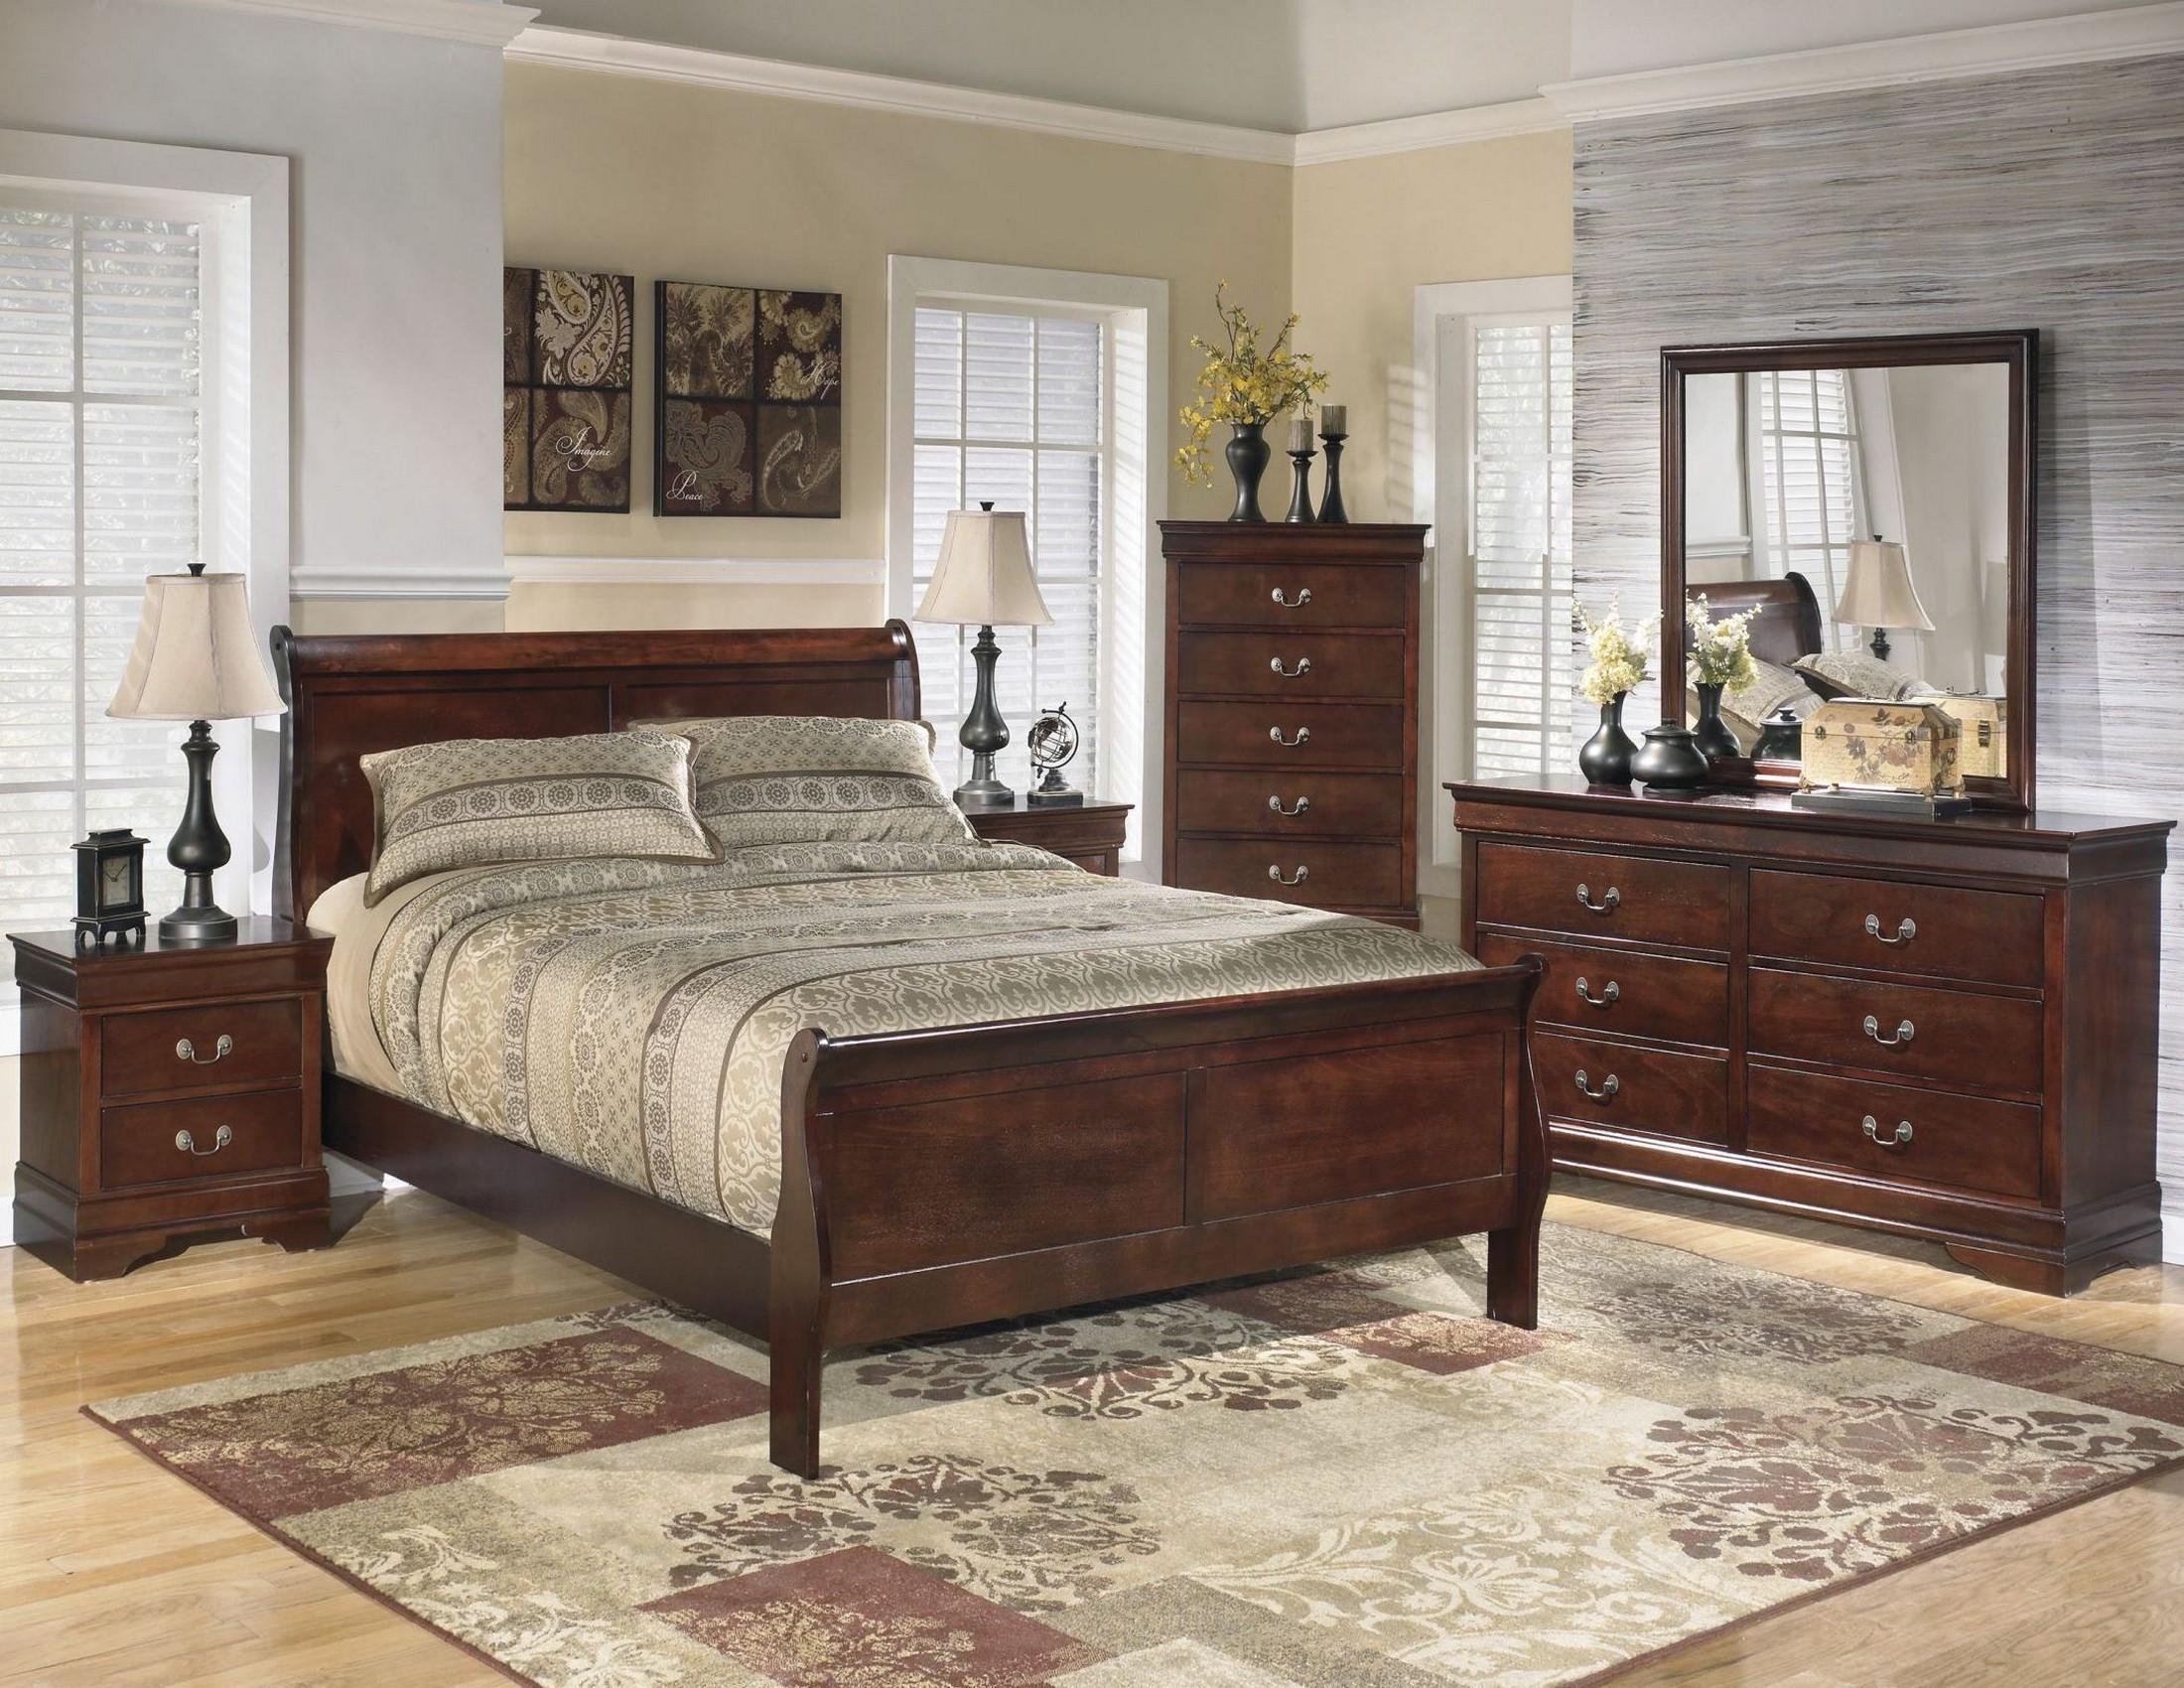 Alisdair sleigh bedroom set from ashley b376 81 96 - Ashley furniture sleigh bedroom set ...